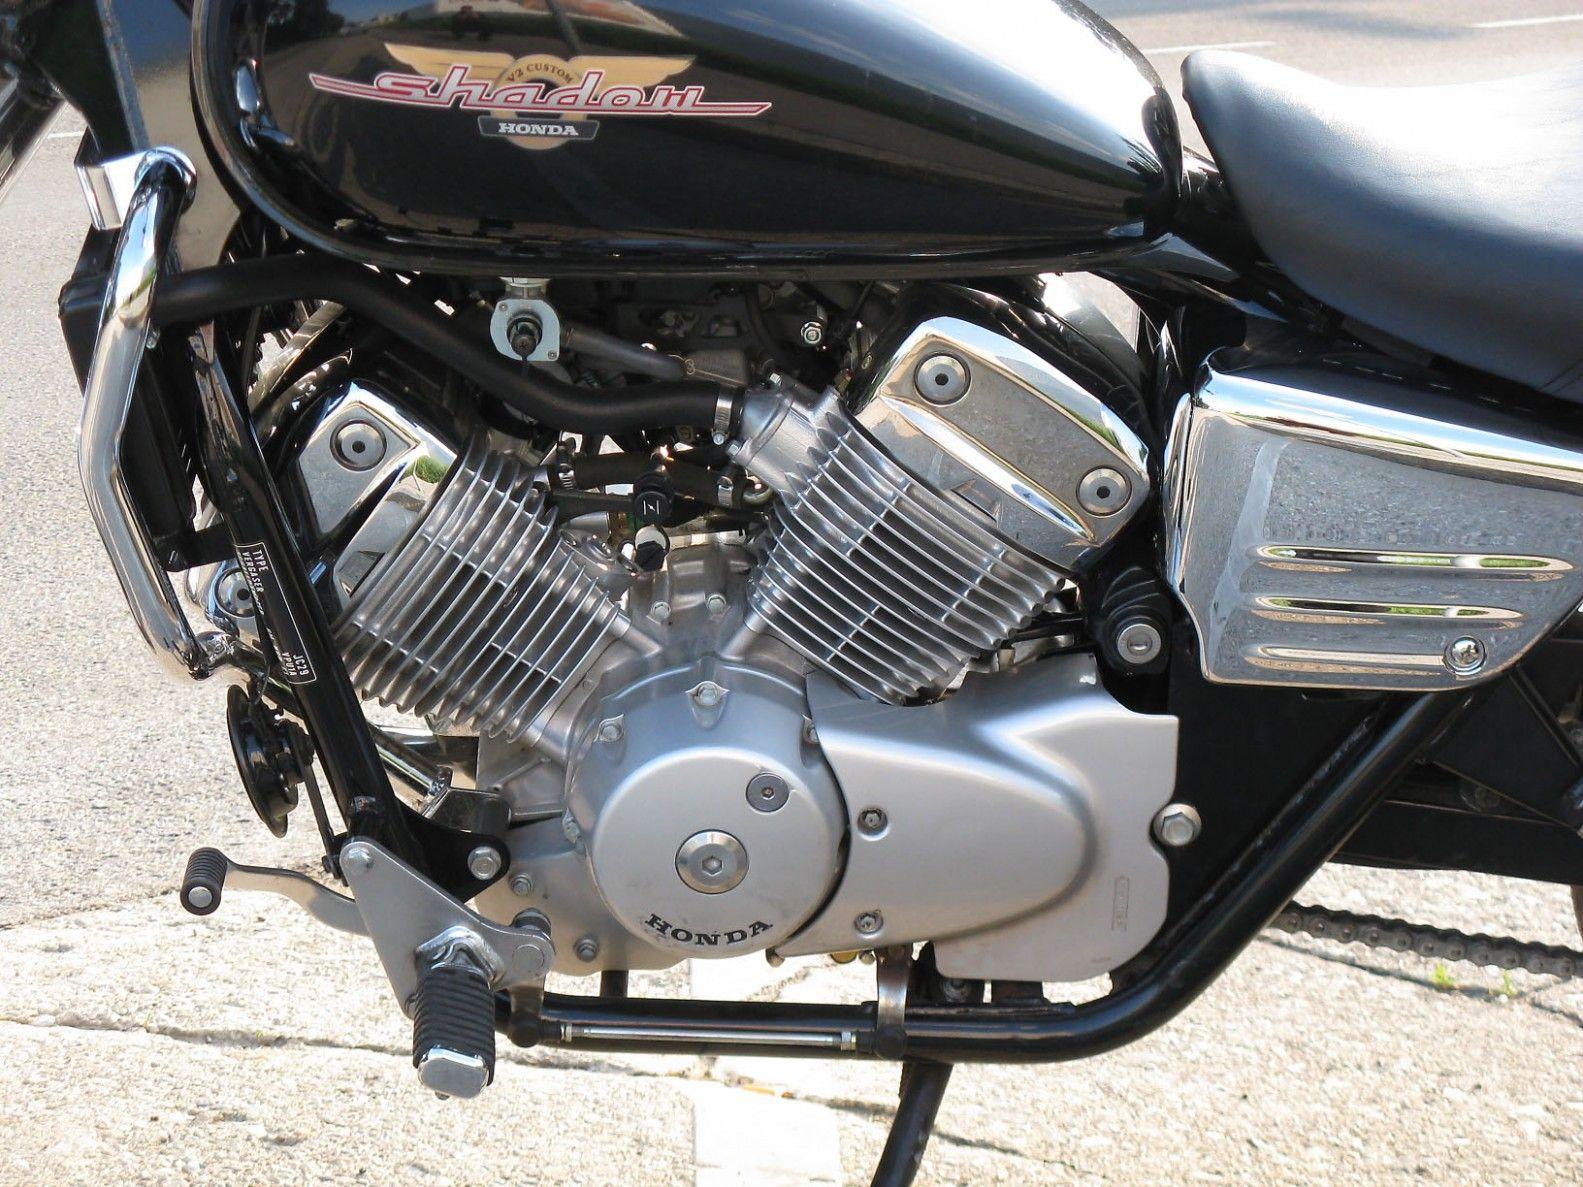 Wiring Diagram For Honda Shadow 1100 Motorcycle